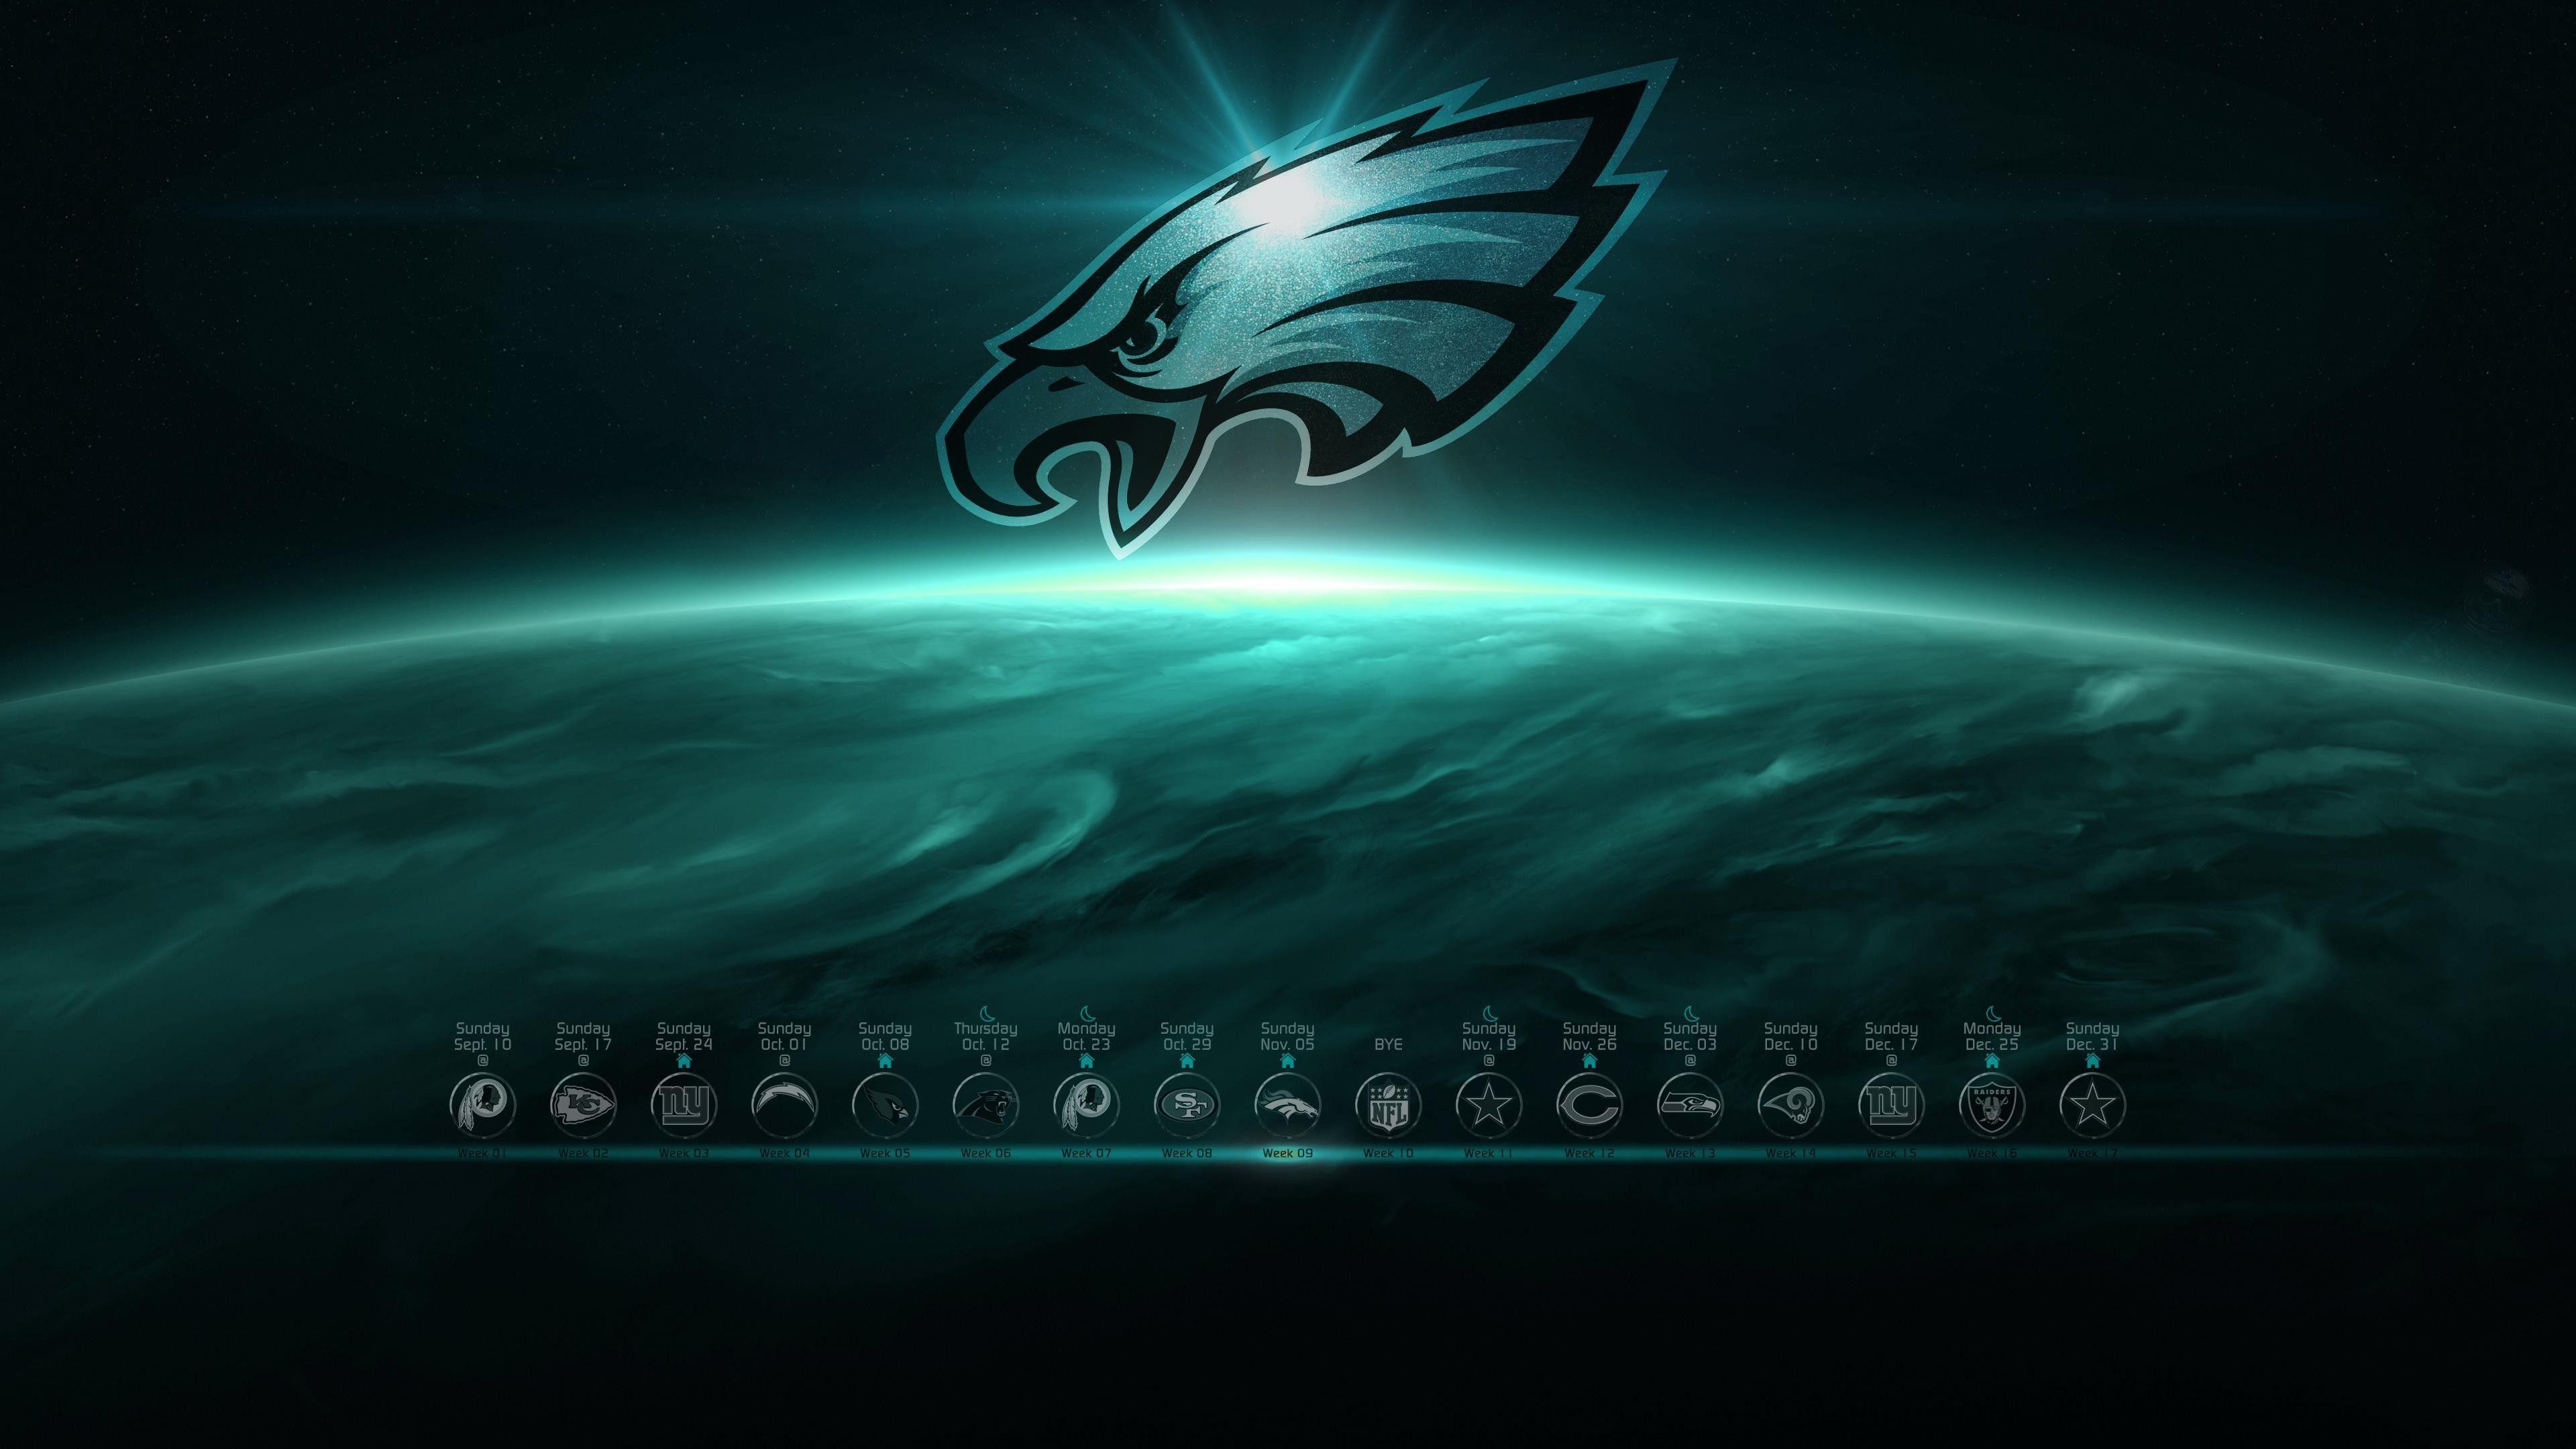 Philadelphia Eagles Wallpapers - Top